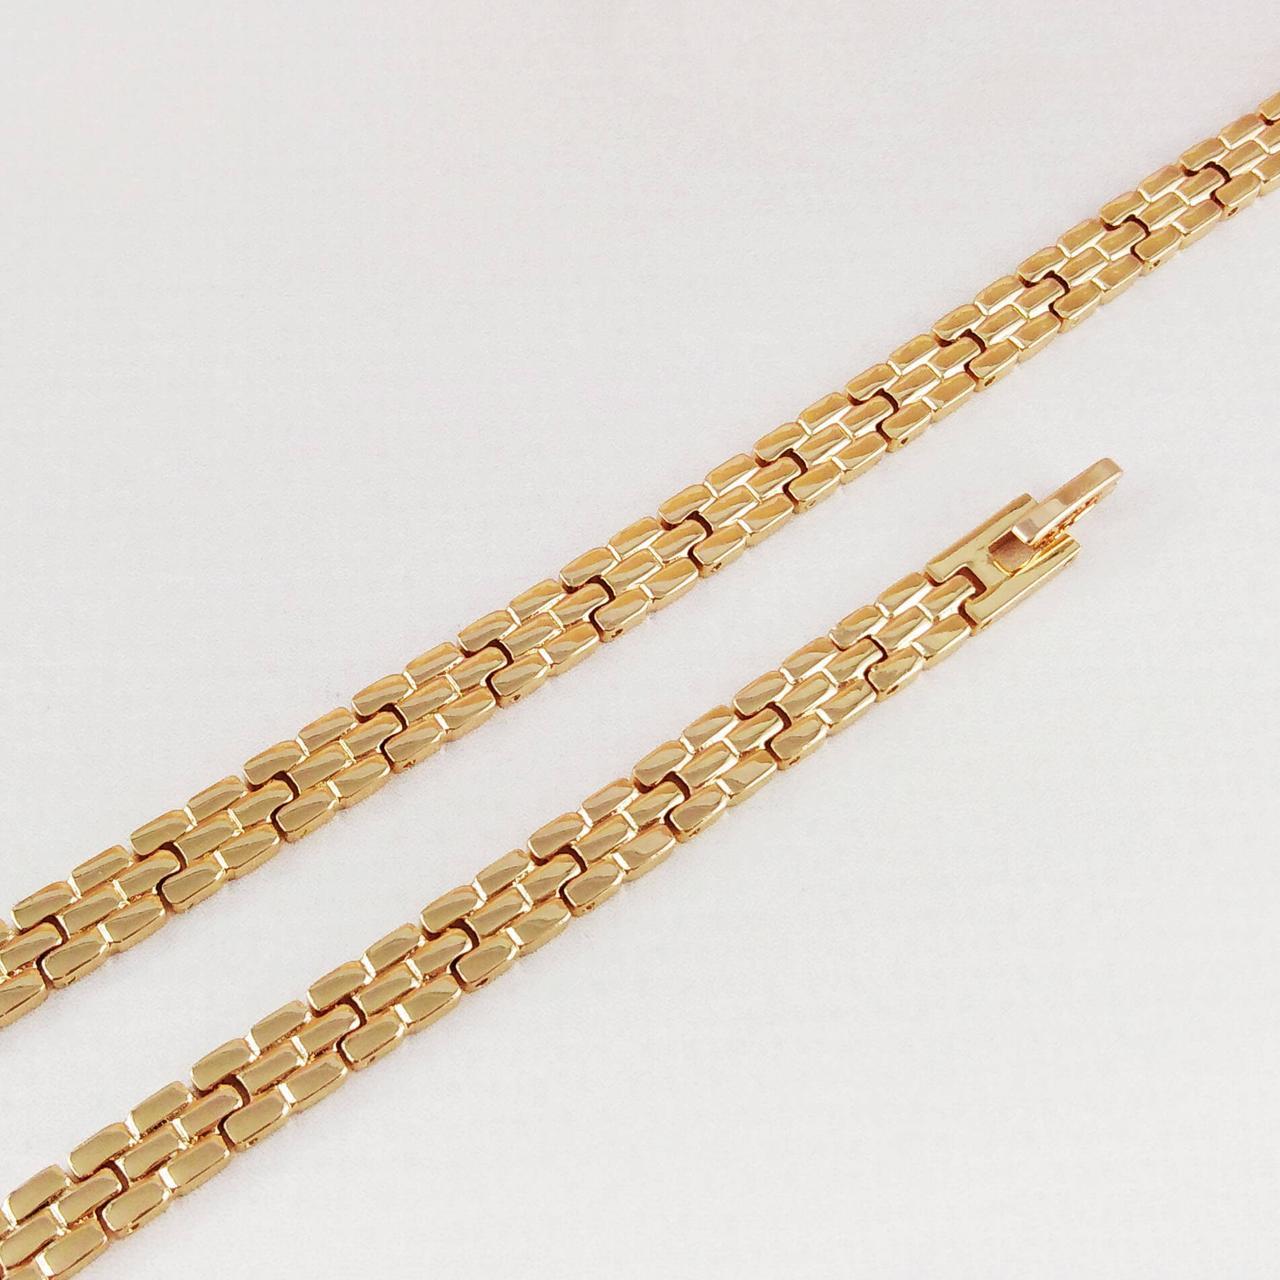 Браслет Xuping Jewelry 19,5 см х 6 мм Браслетное плетение медицинское золото позолота 18К А/В 4828